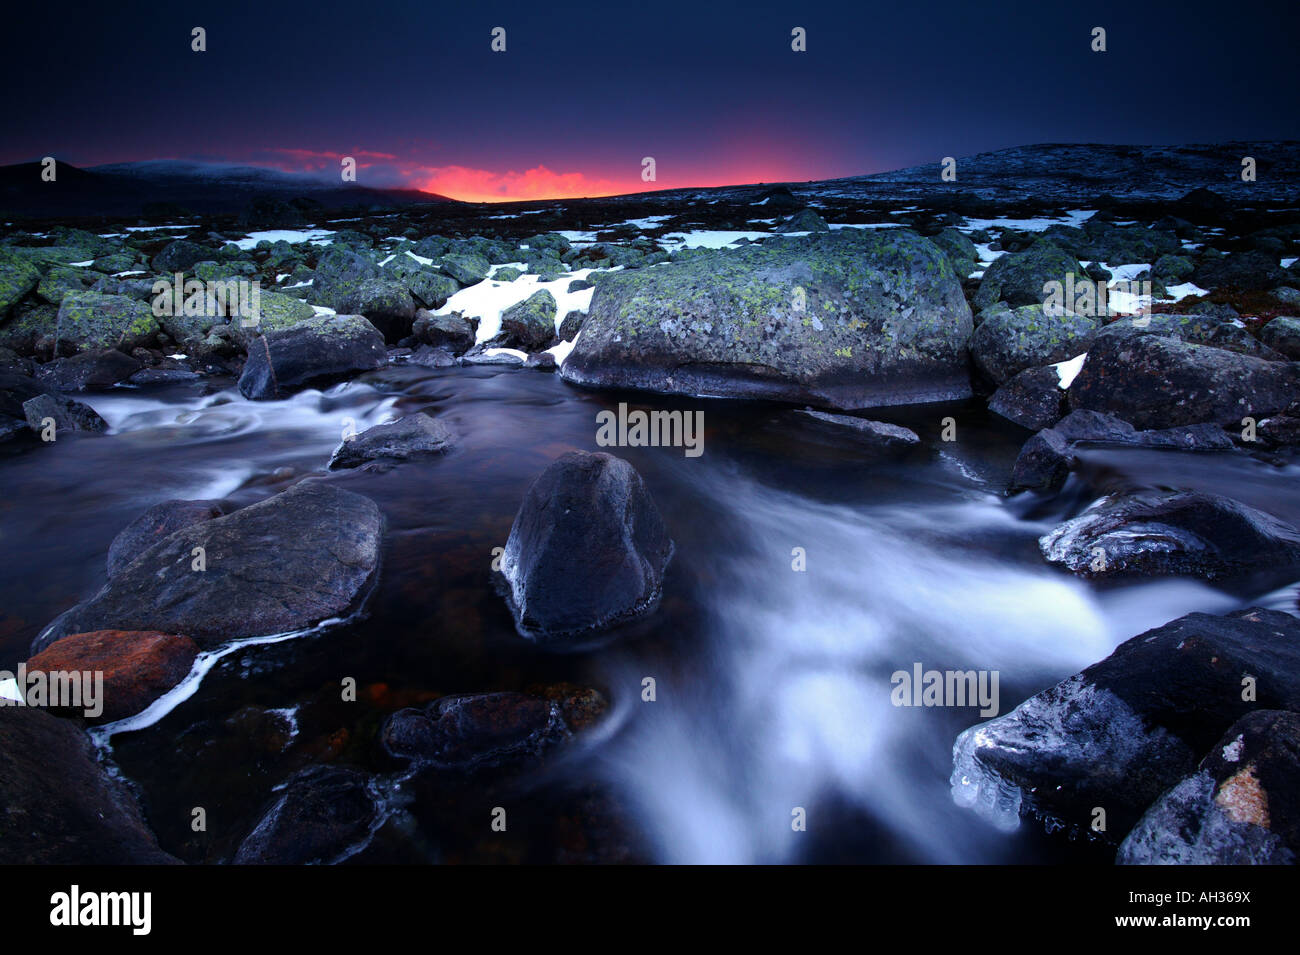 Amazing and beautiful sunrise at Valdresflya in Jotunheimen mountainrange, Norway. - Stock Image